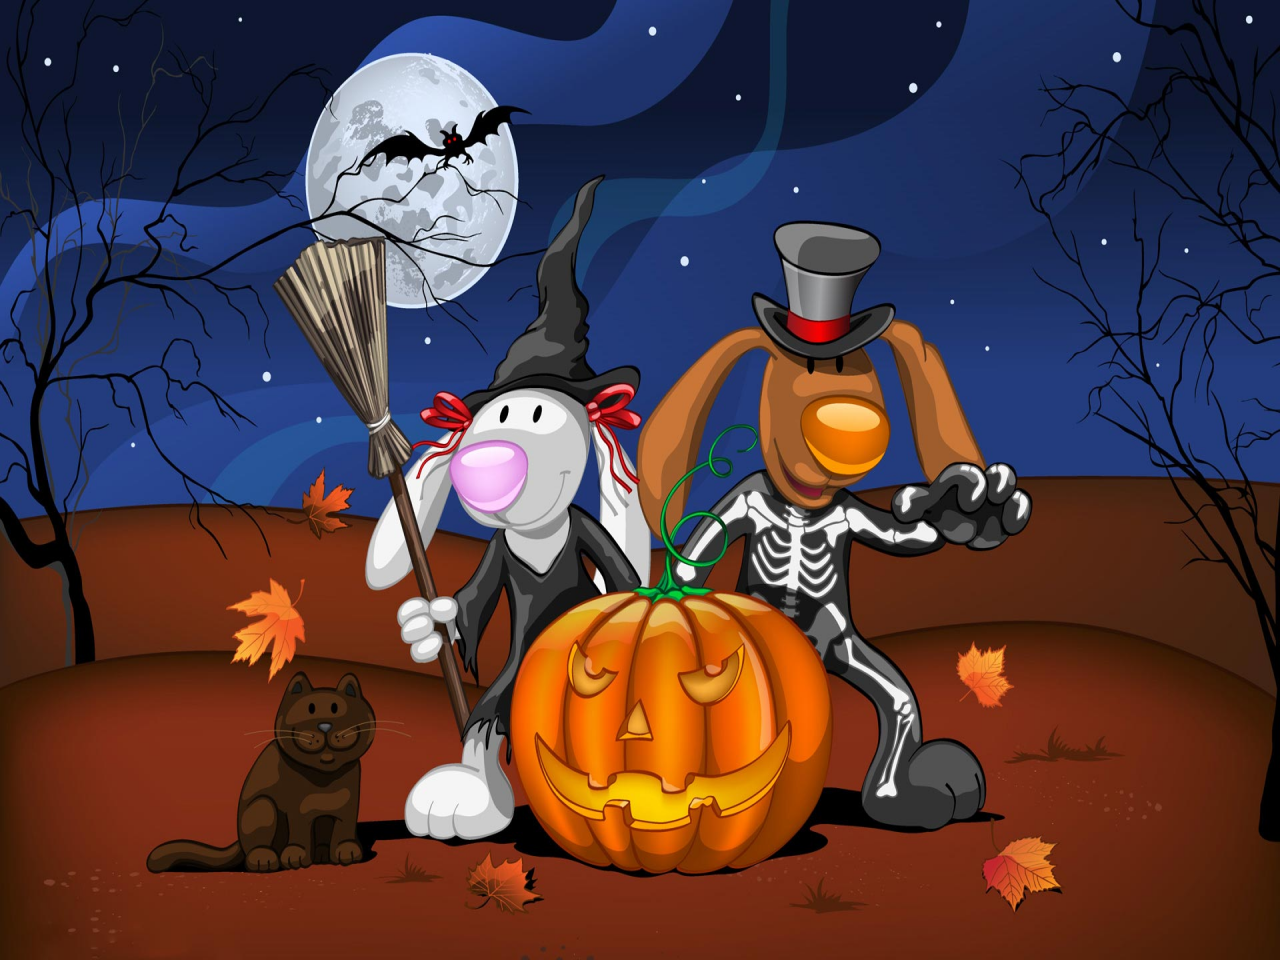 bigbackgroundcomhalloweenscary halloween desktop wallpaperhtml 1280x960